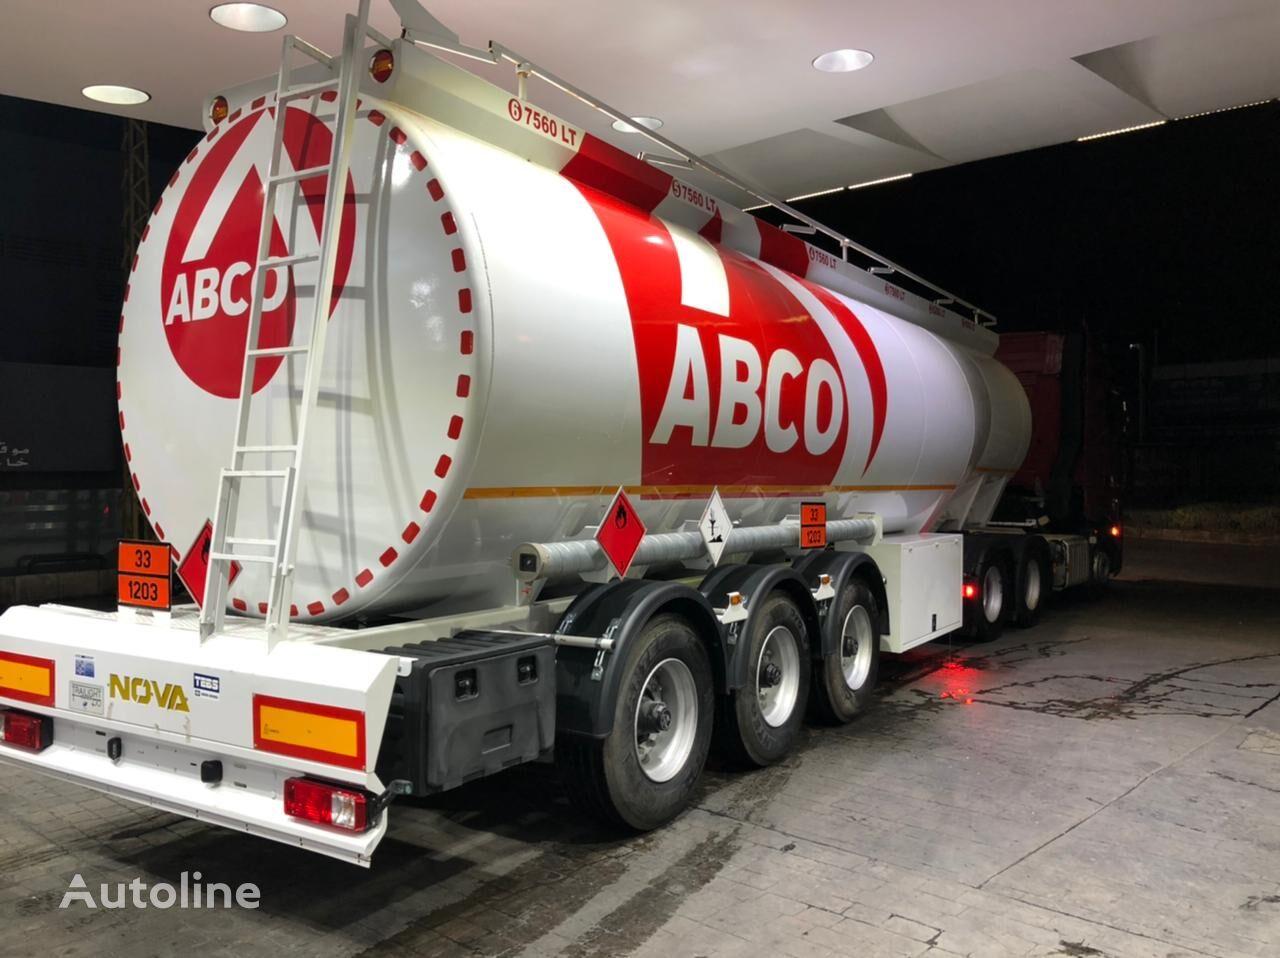 new NOVA NOUVELLE PRODUCTION DE REMORQUE DE CARBURANT EN ACIER ET ALUMINI fuel tank trailer